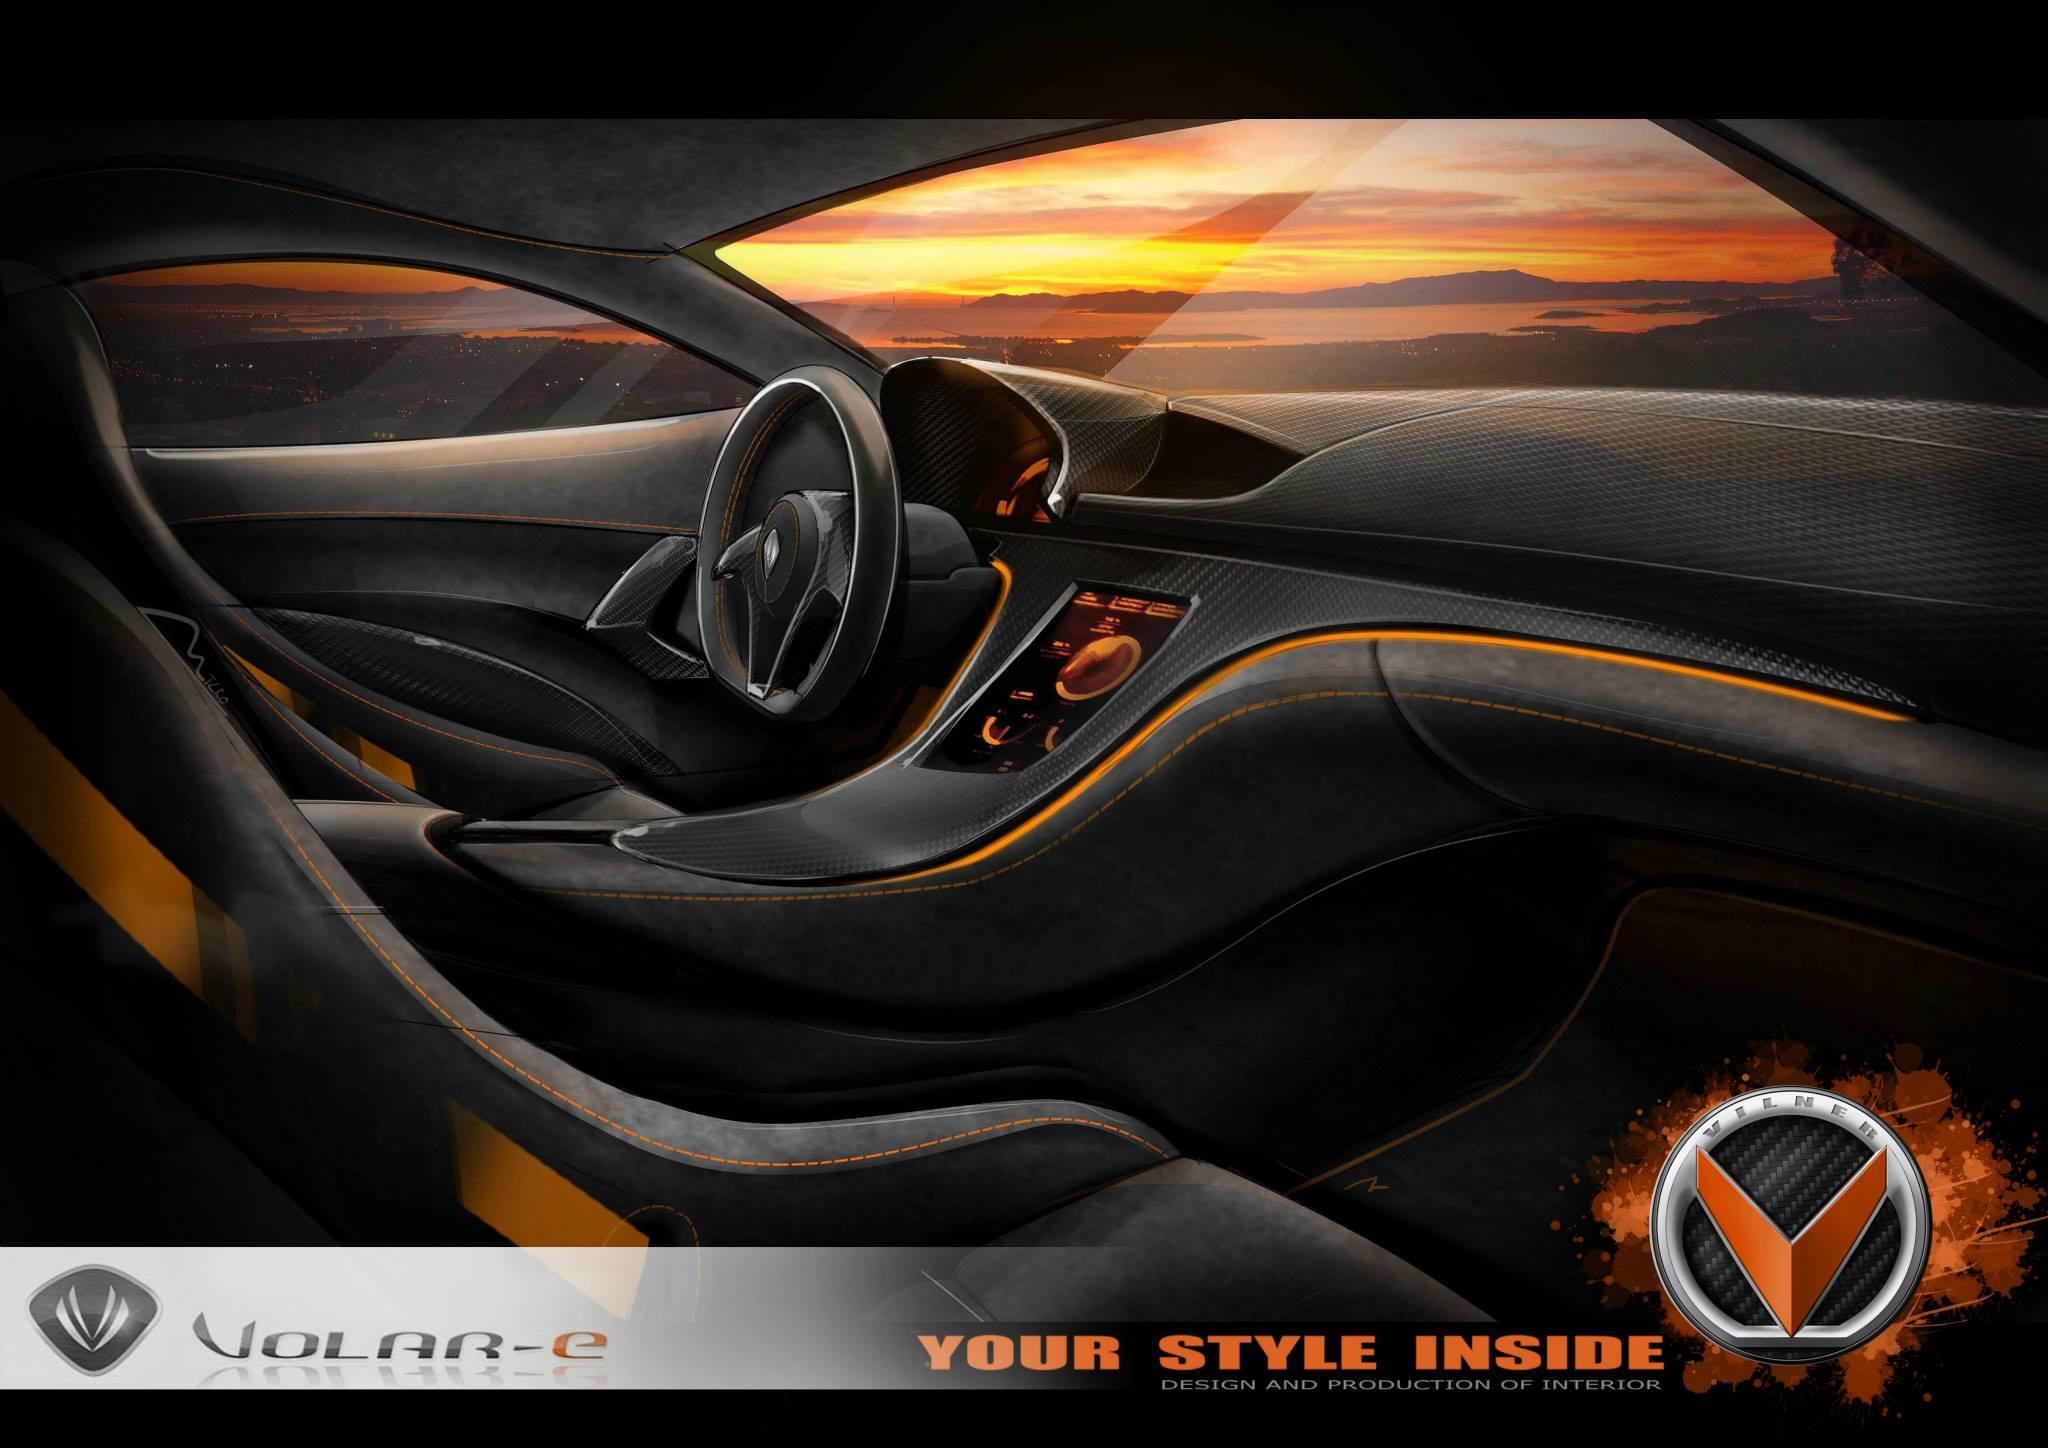 volar-e-applus-idiada-with-interior-by-vilner-06